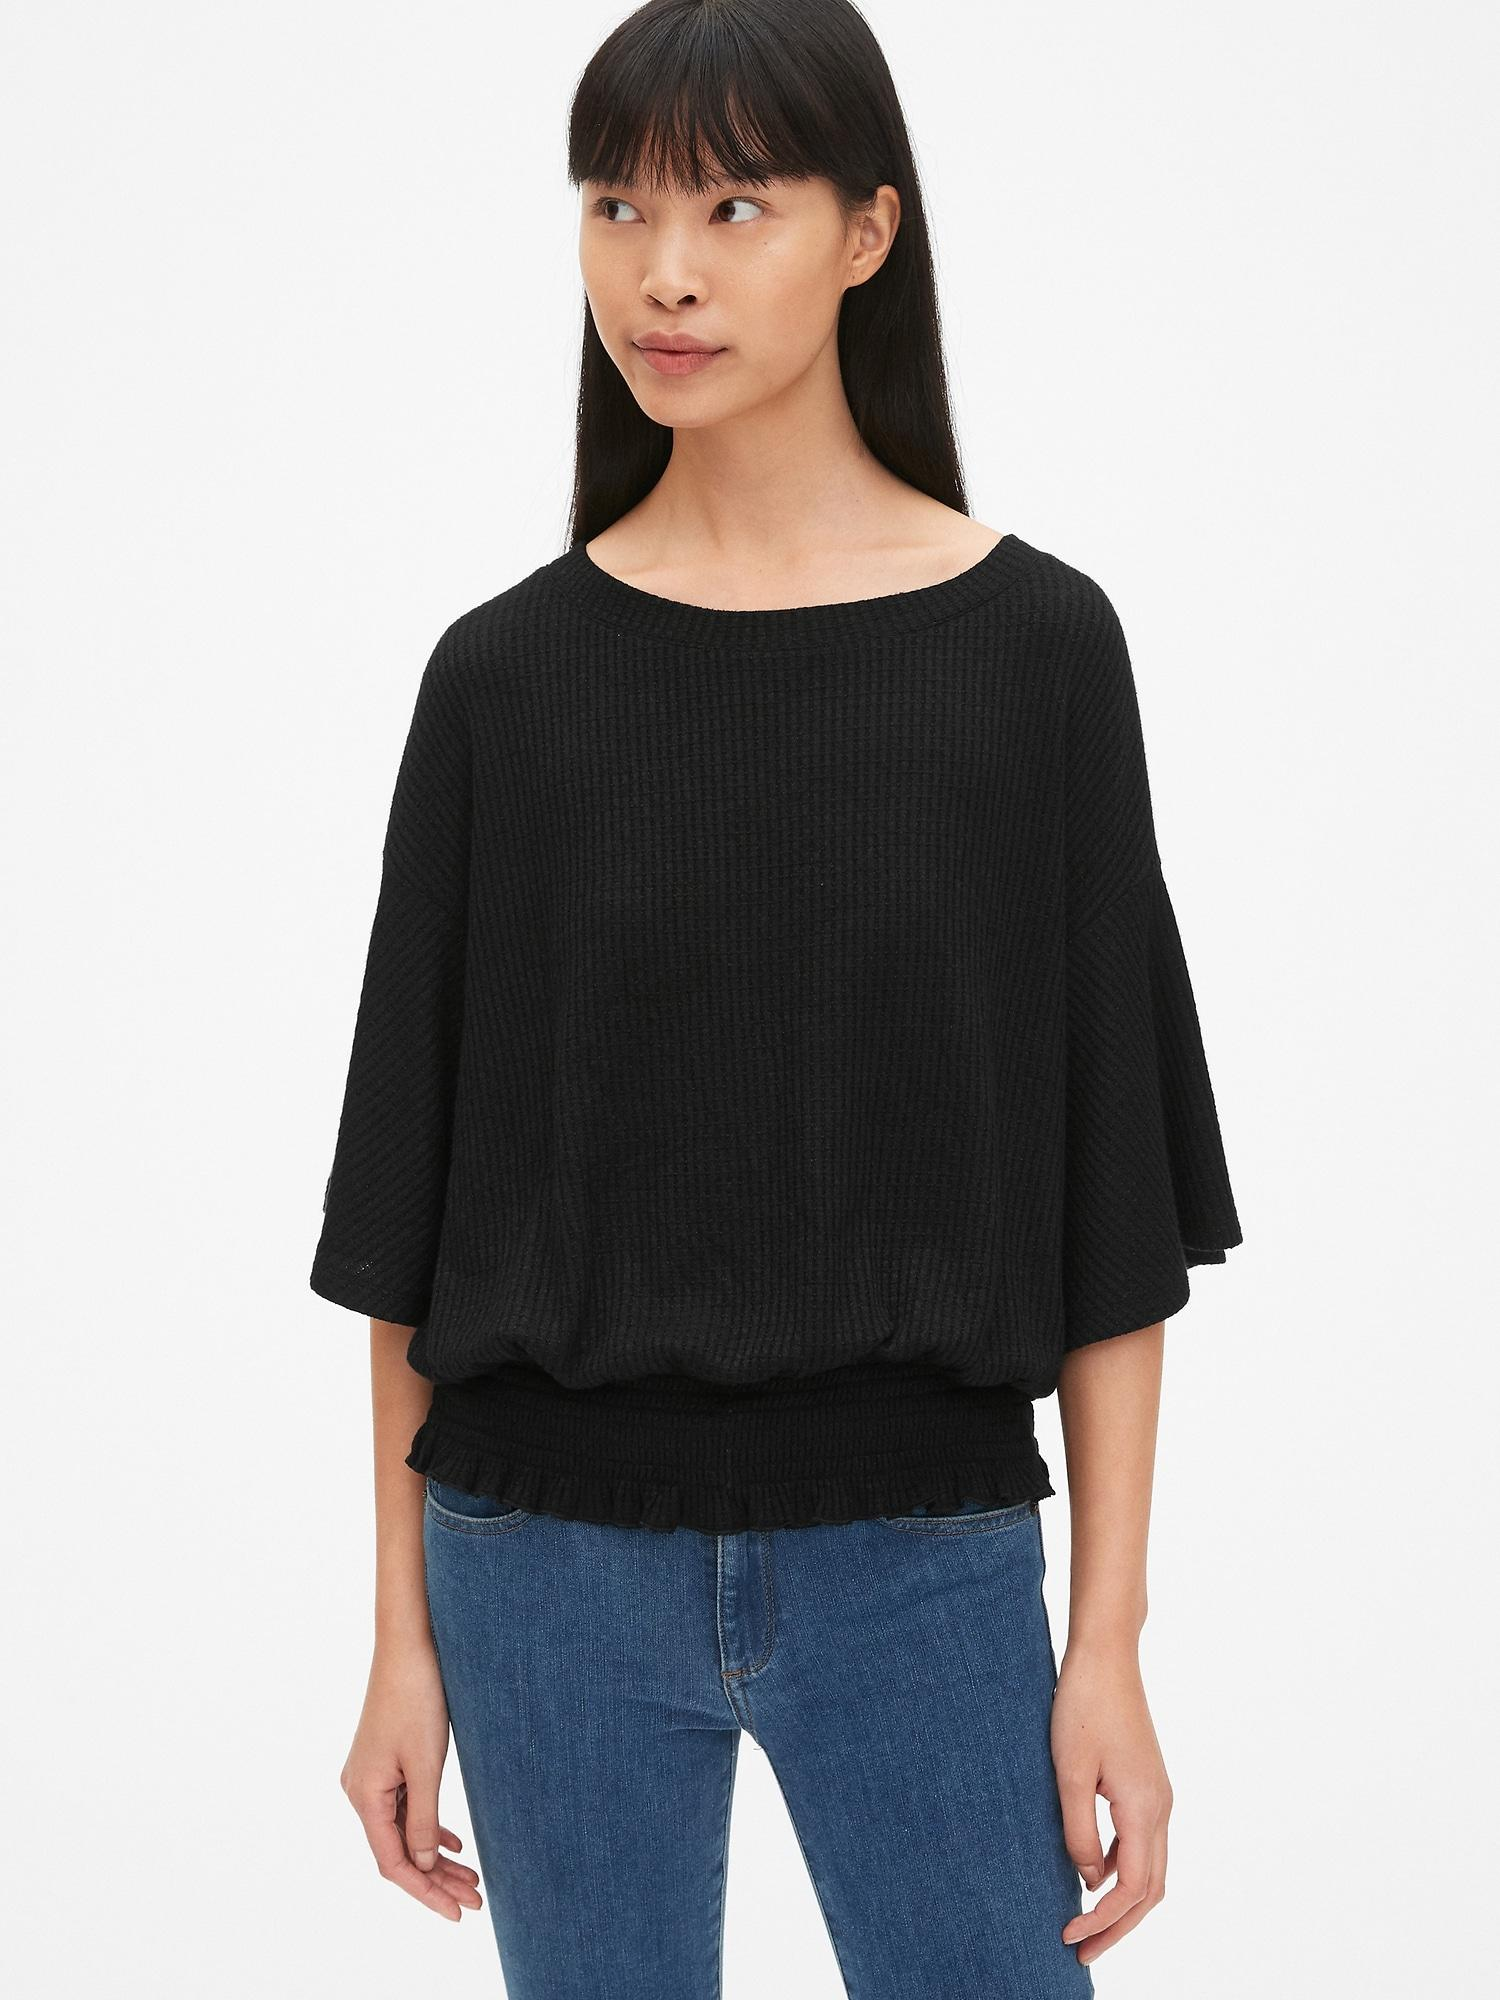 4f1c31aeace5e Lyst - Gap Softspun Waffle-knit Smocked Short Sleeve Top in Black